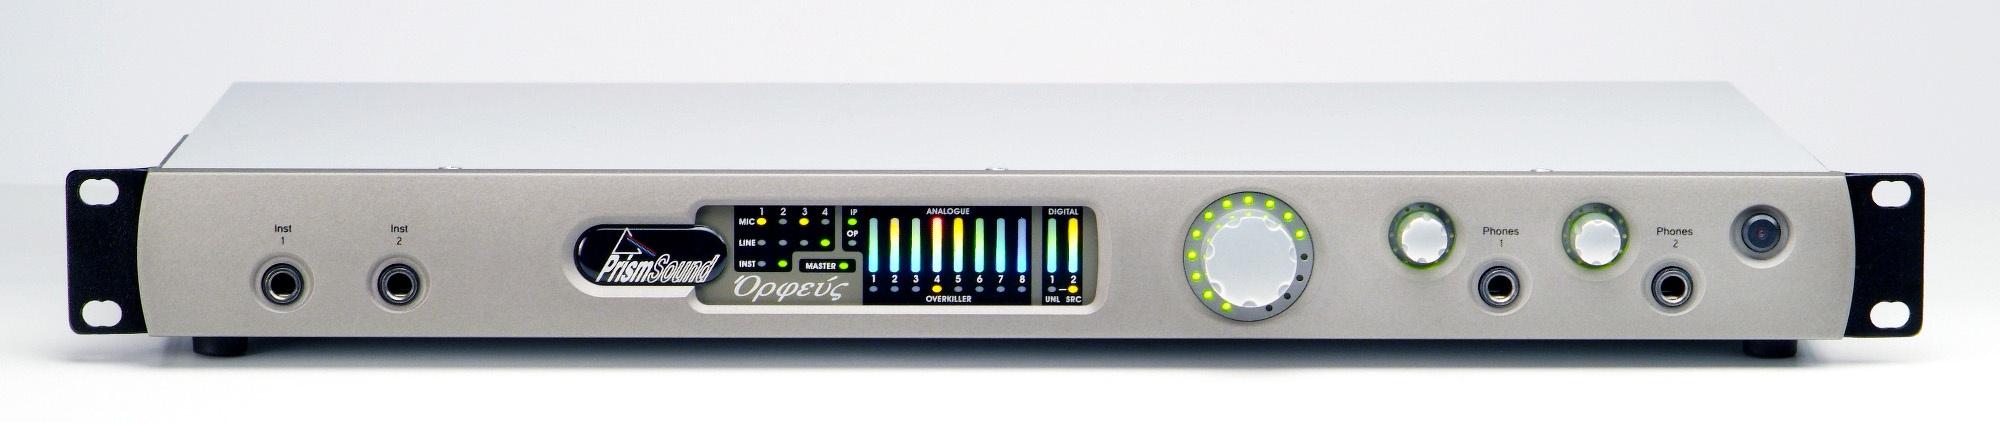 Musical Instruments & Gear Audio/midi Interfaces Prism Sound Orpheus